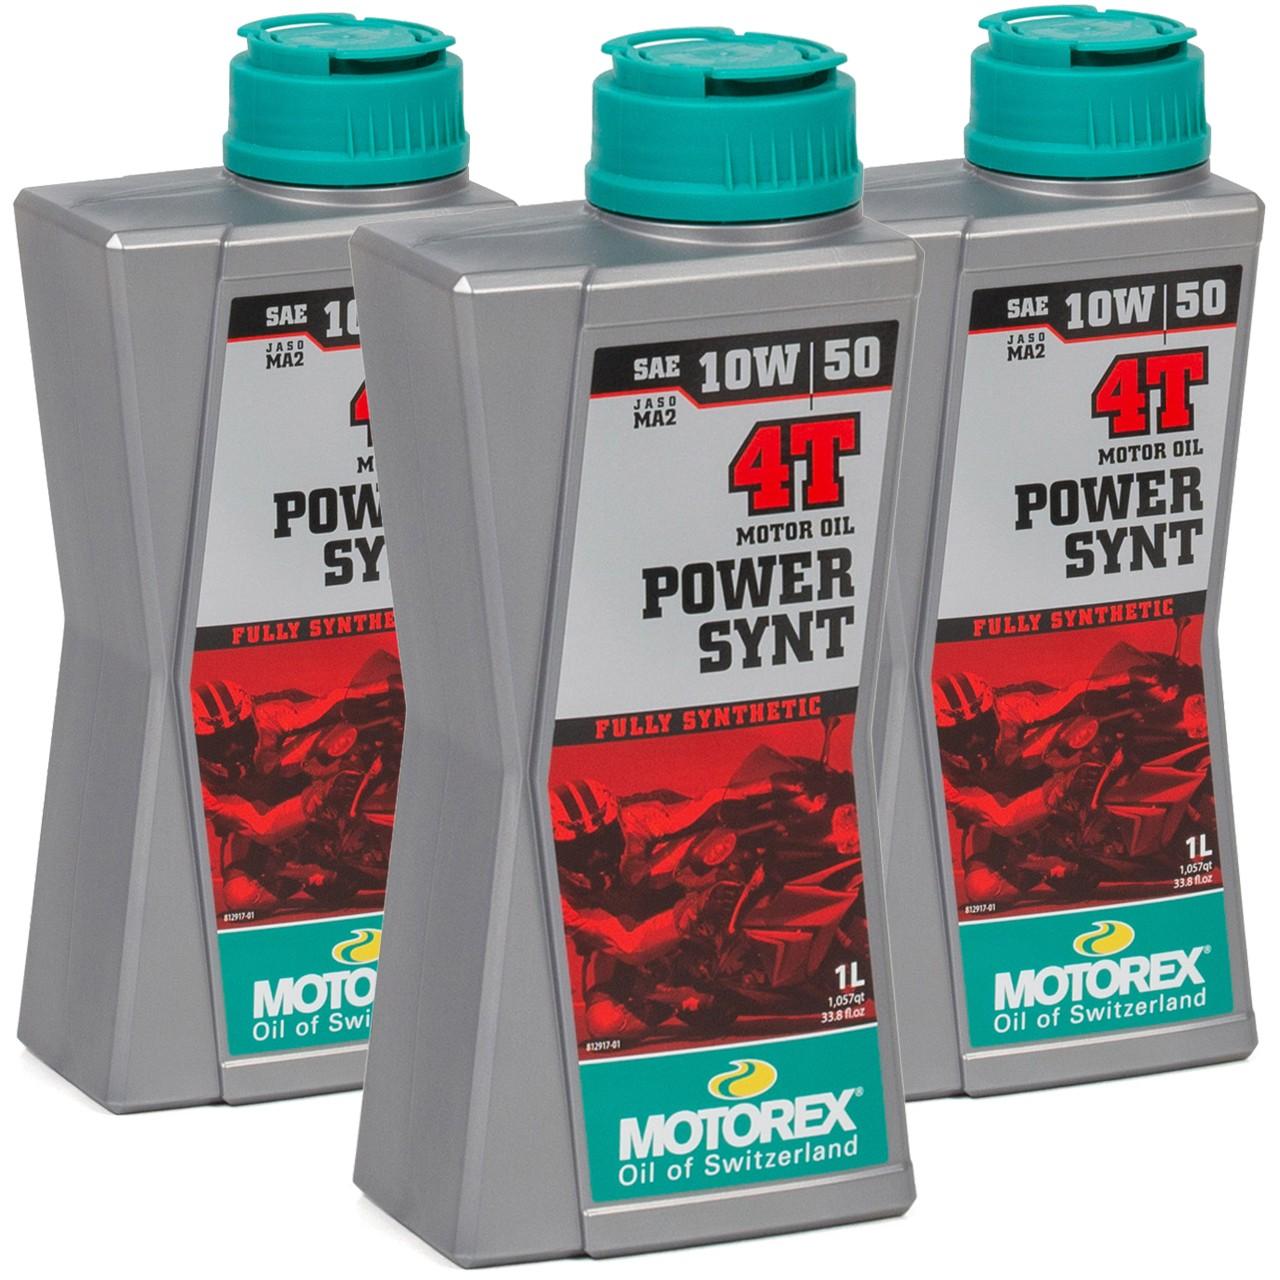 MOTOREX Power Synt 4T Motoröl Öl 10W50 JASO MA2 API SN/SM/SL - 3L 3 Liter